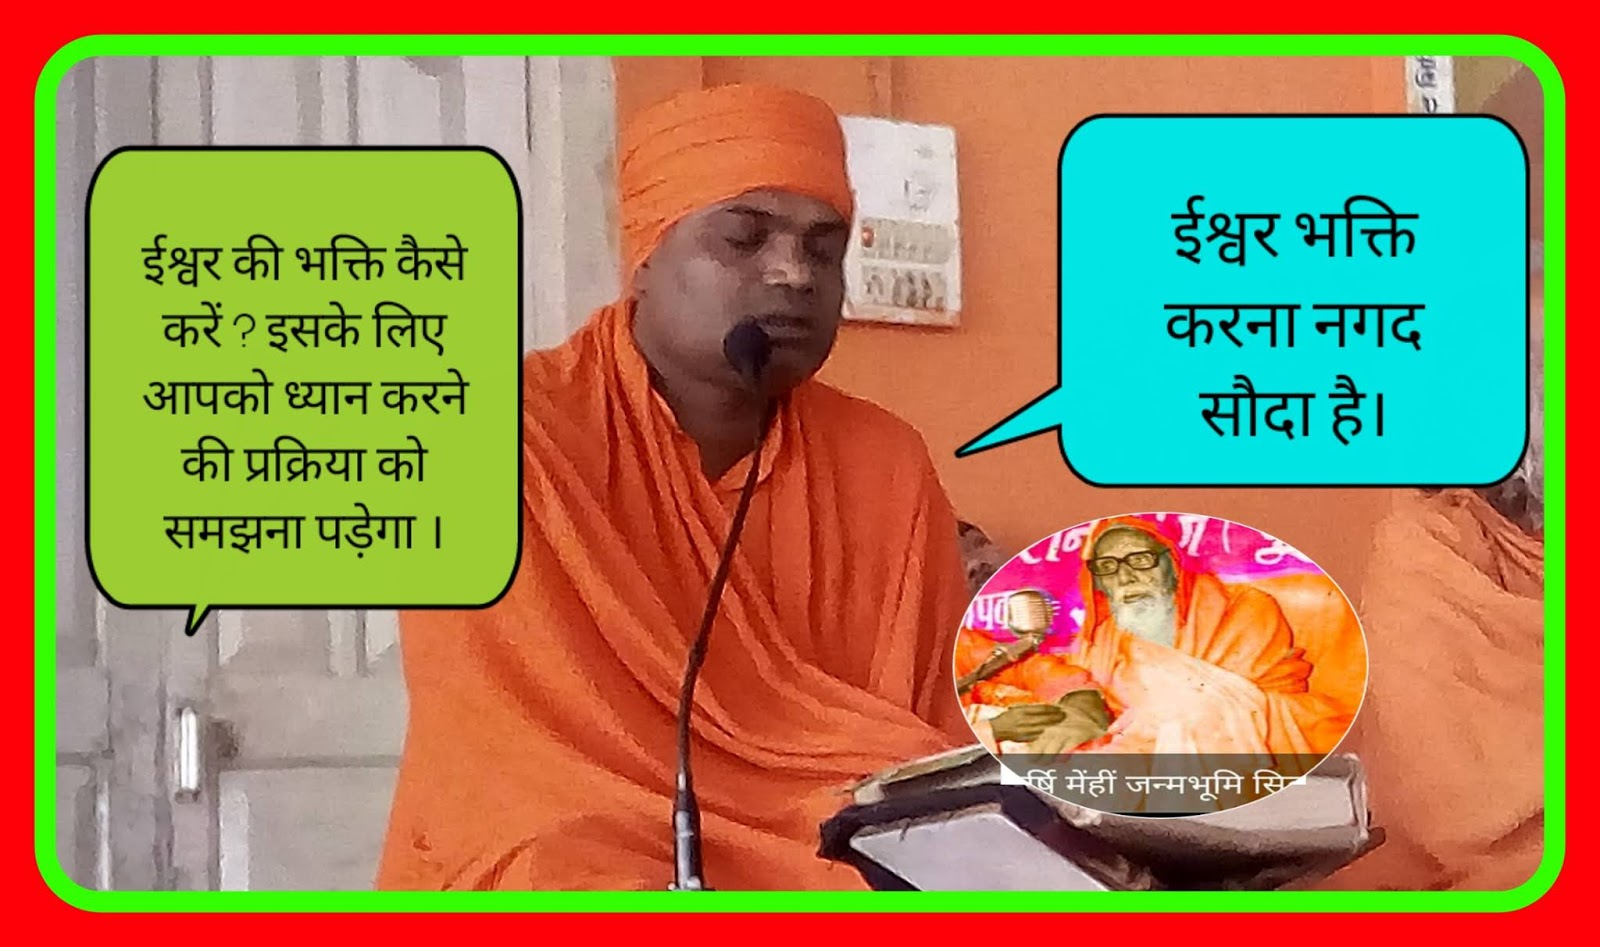 गुरु महाराज का प्रवचन पाठ करते रविंद्र बाबा